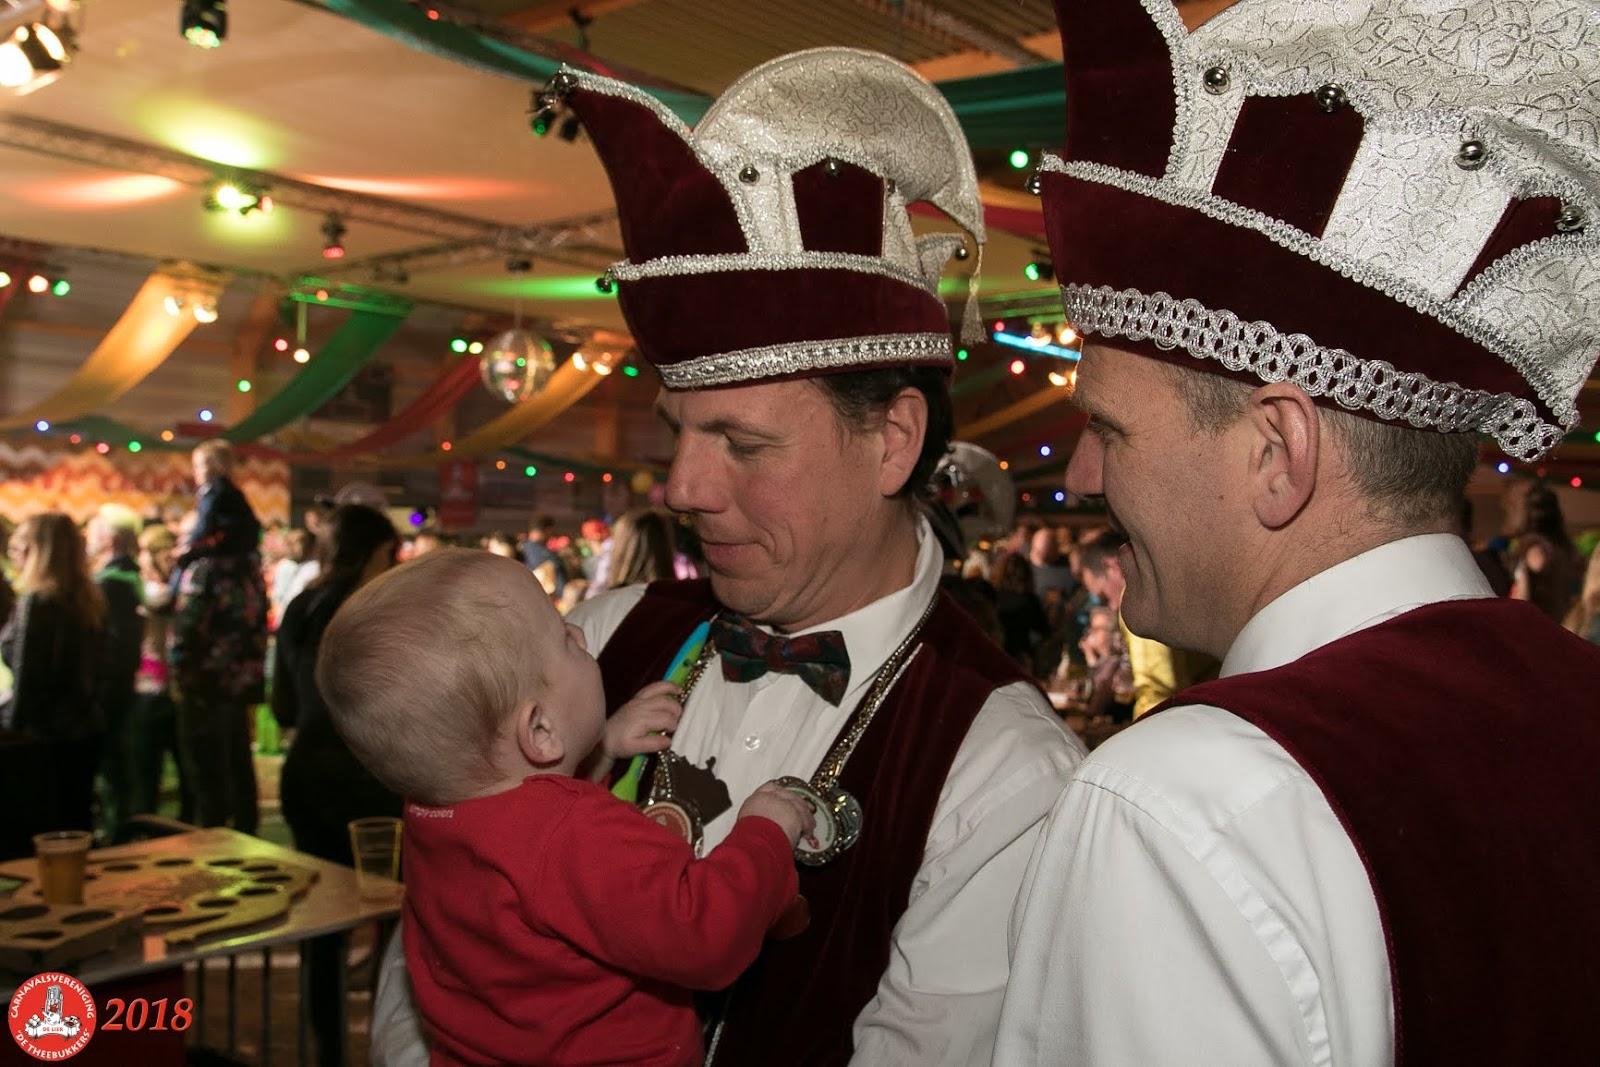 a Familie Carnaval 2018 - FamilieCarnavalTheebukkers2018-2098.jpg